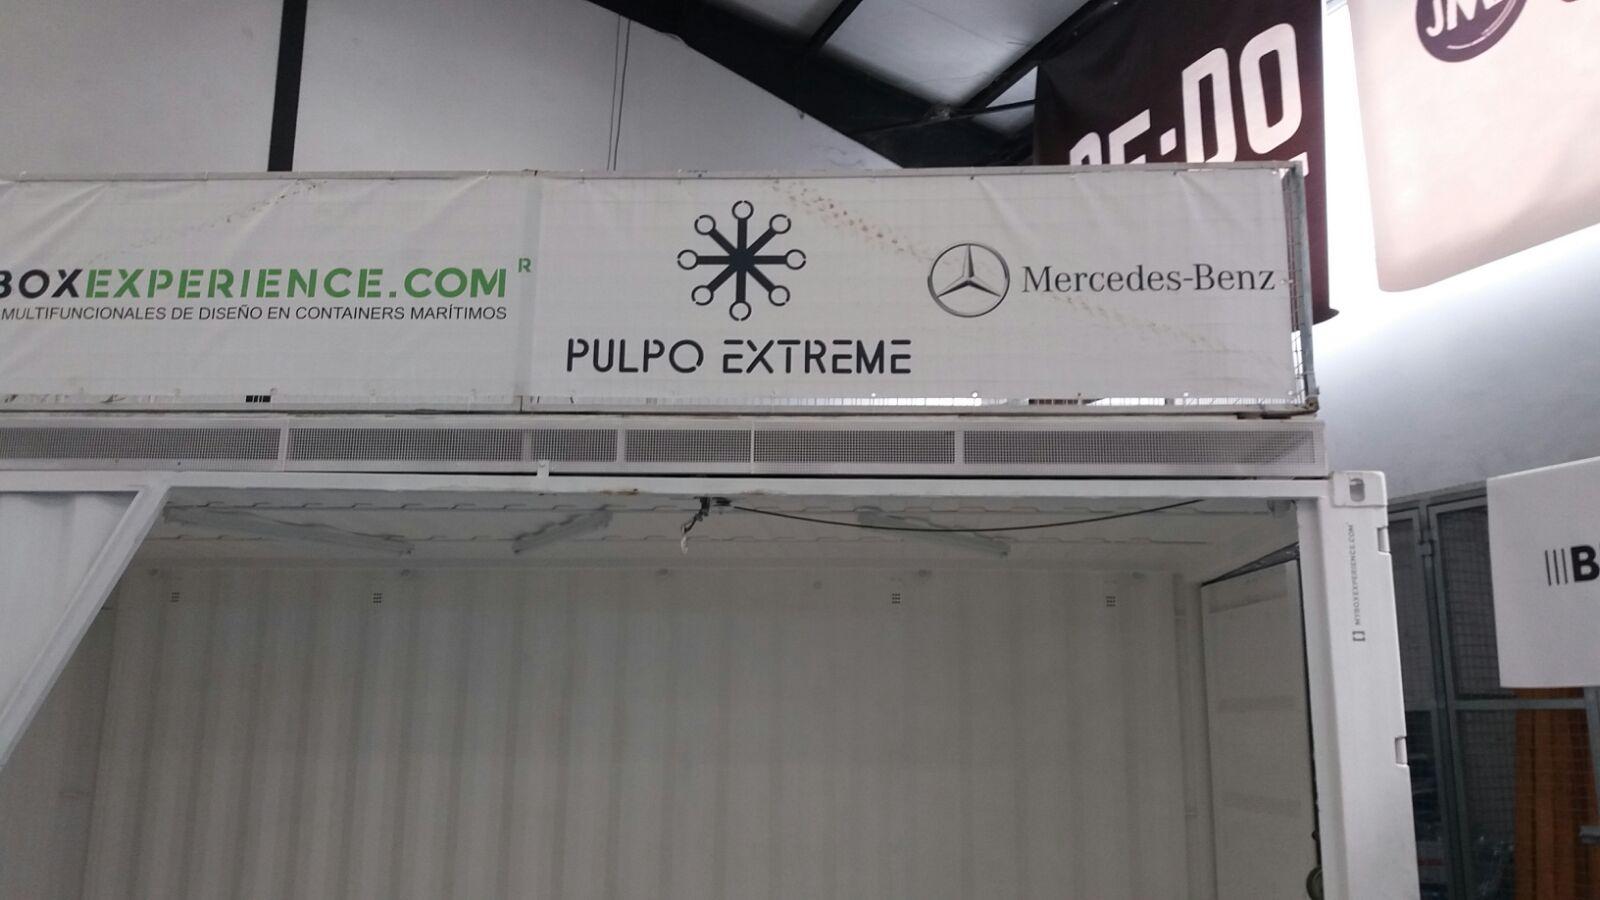 Pulpo Extreme